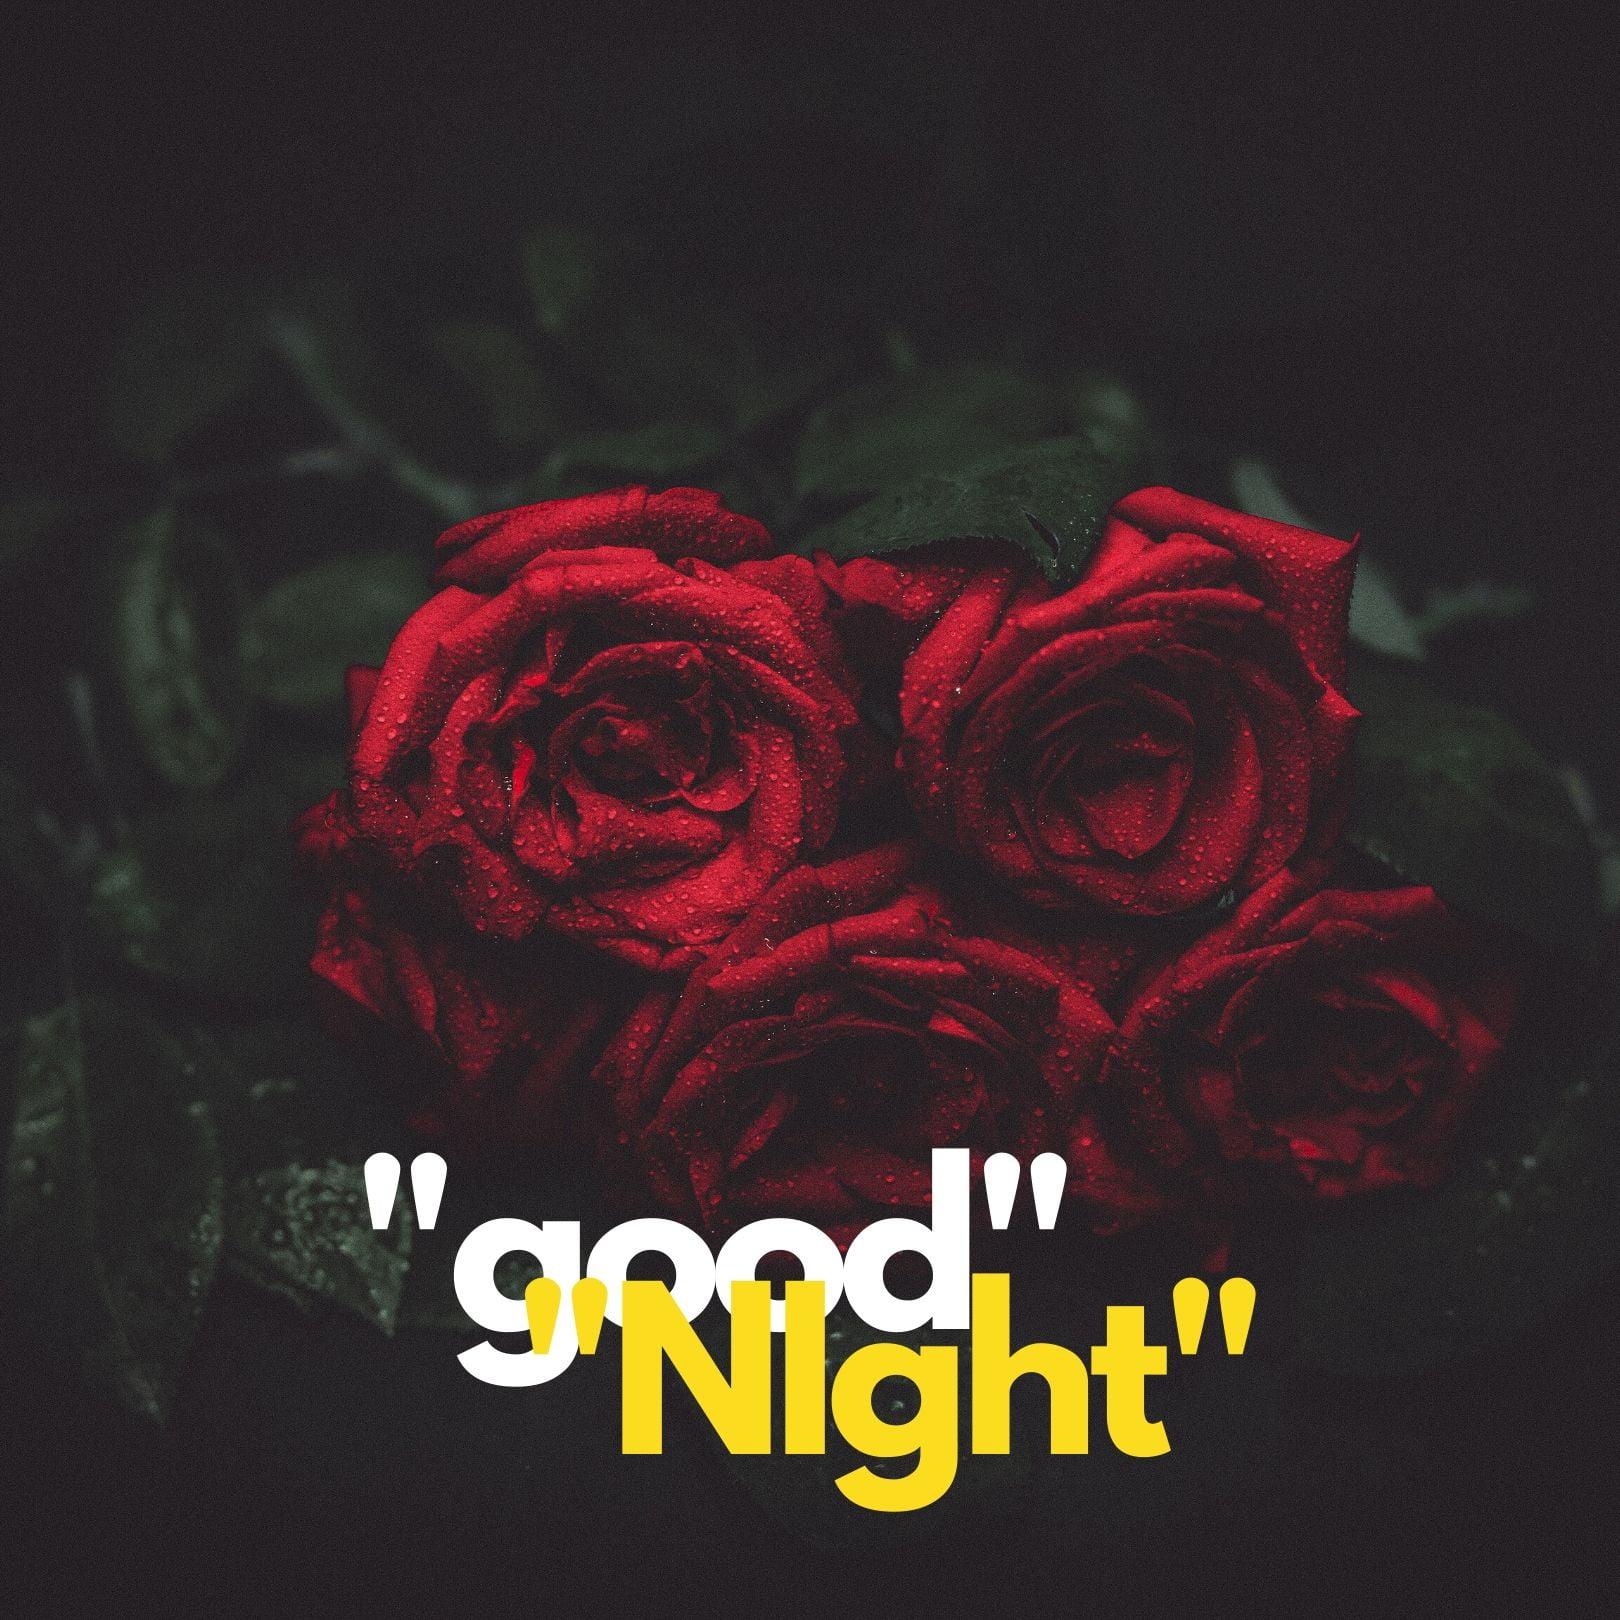 Good Night Rose full HD free download.